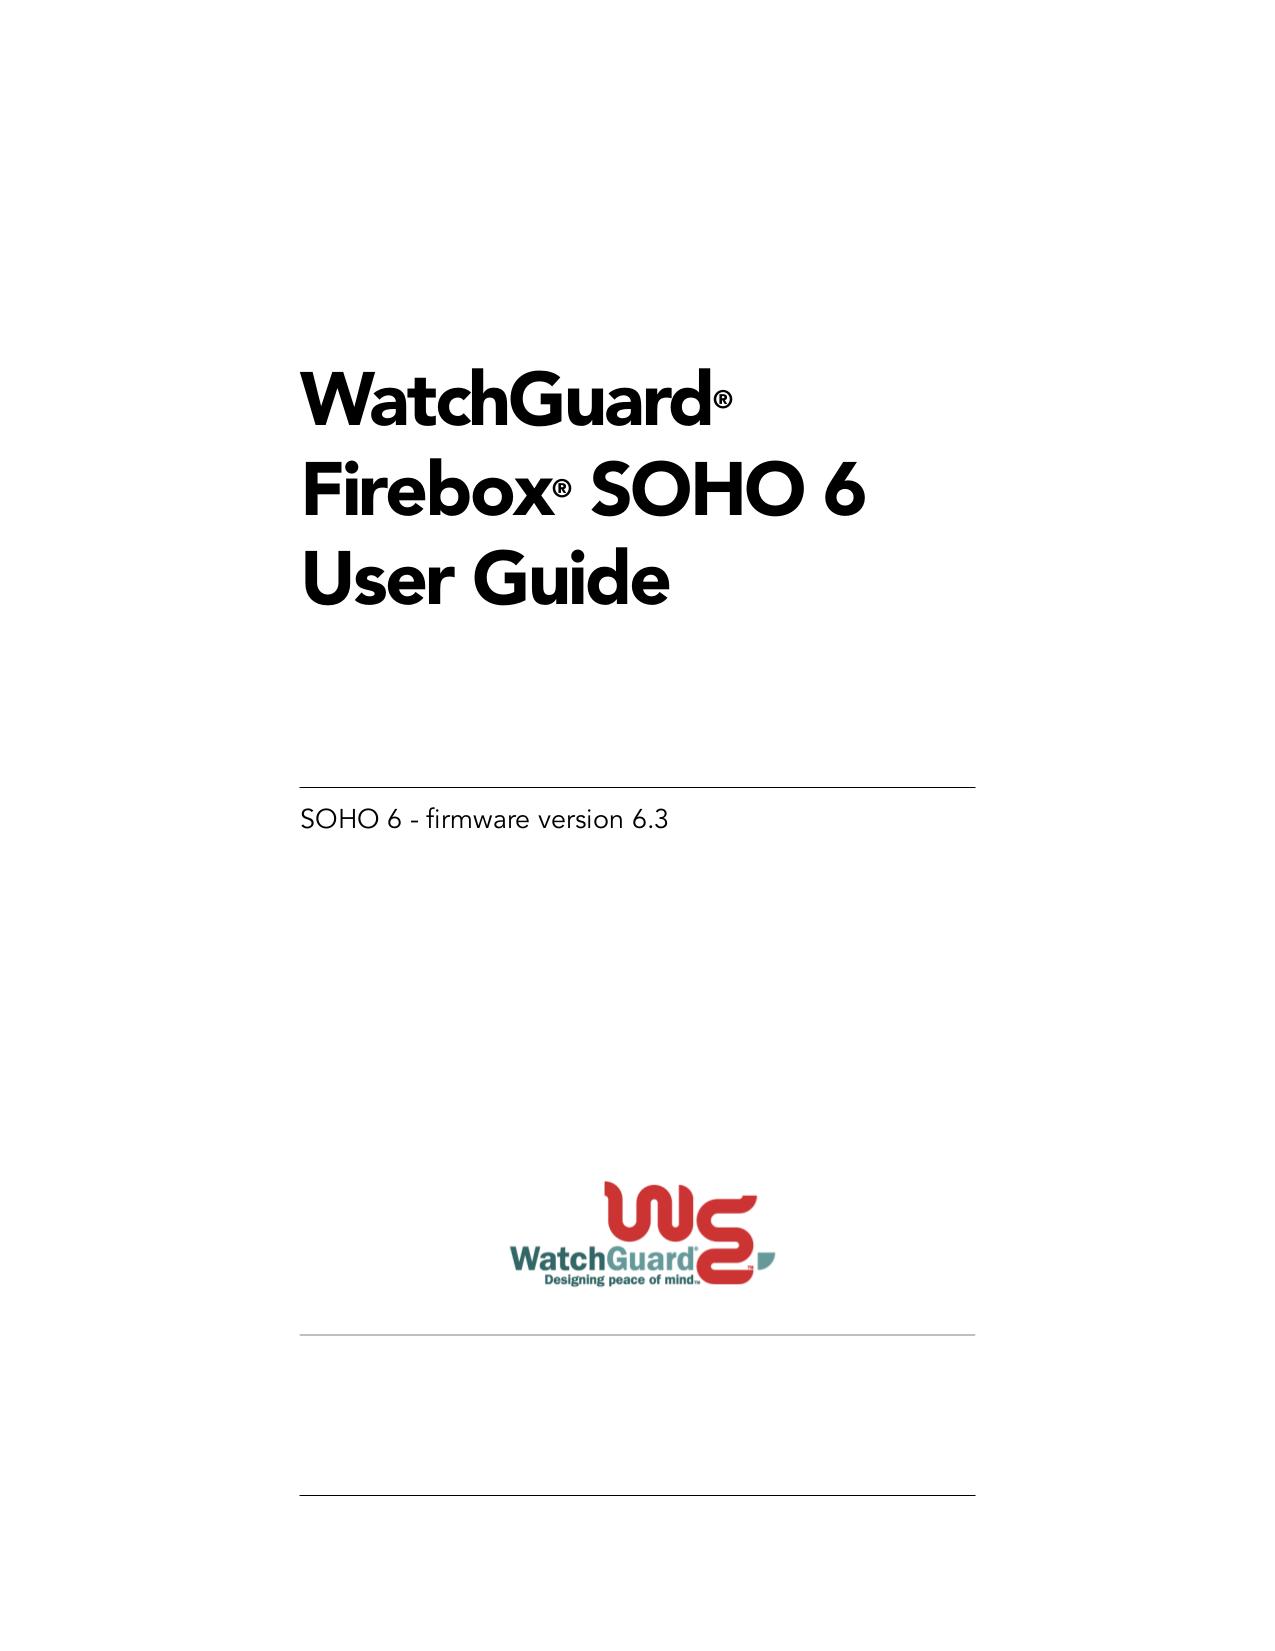 pdf for Watchguard Other Firebox SOHO 6 Wireless Firewall manual